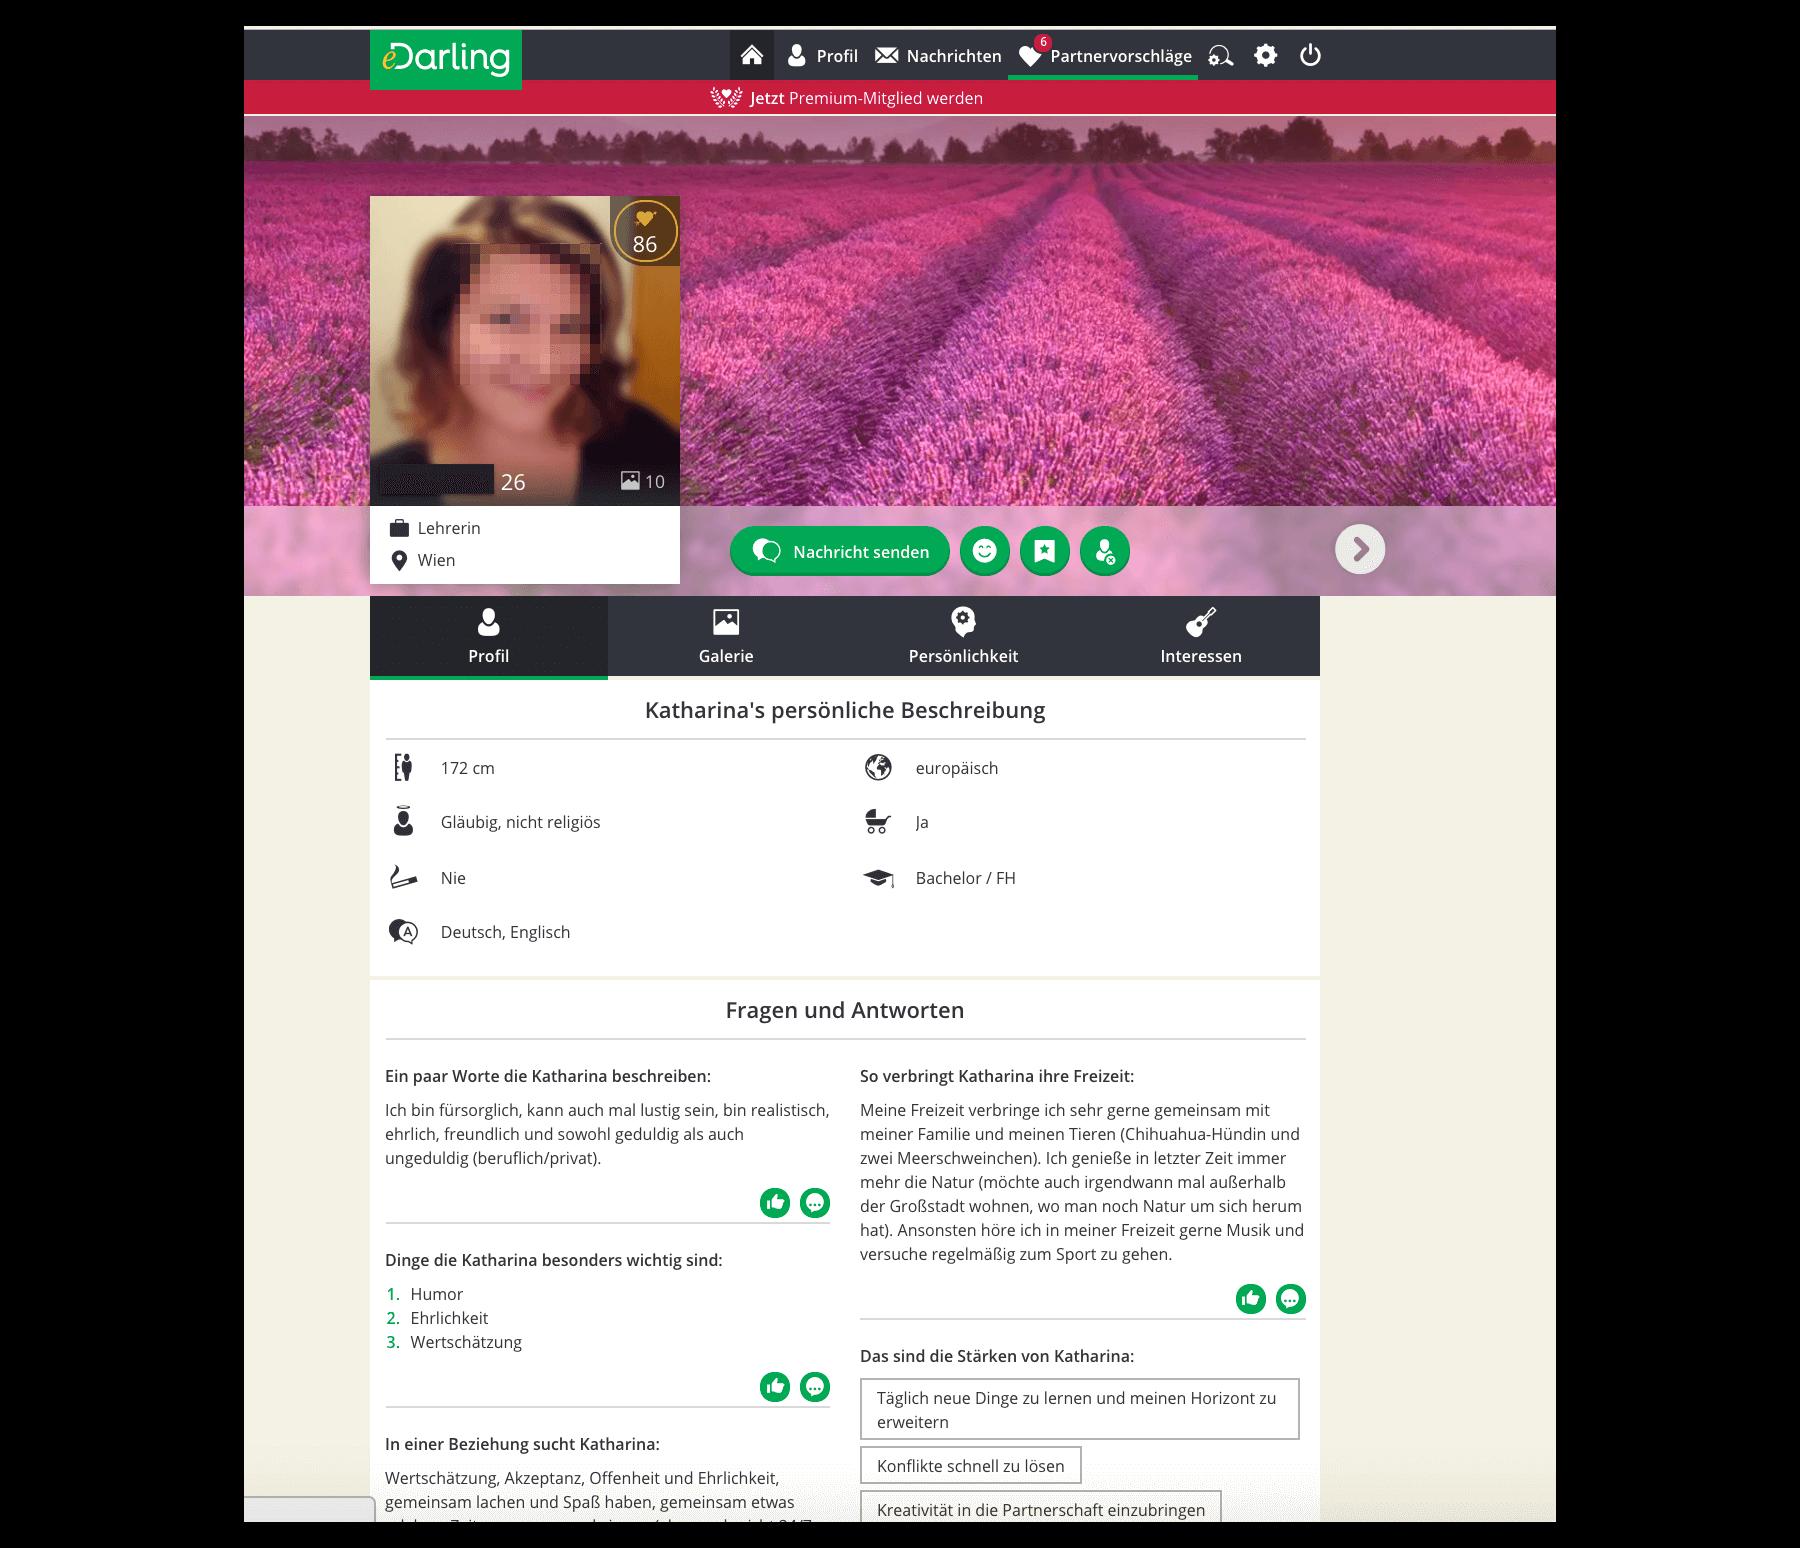 Singlebörse Profil Beispiel